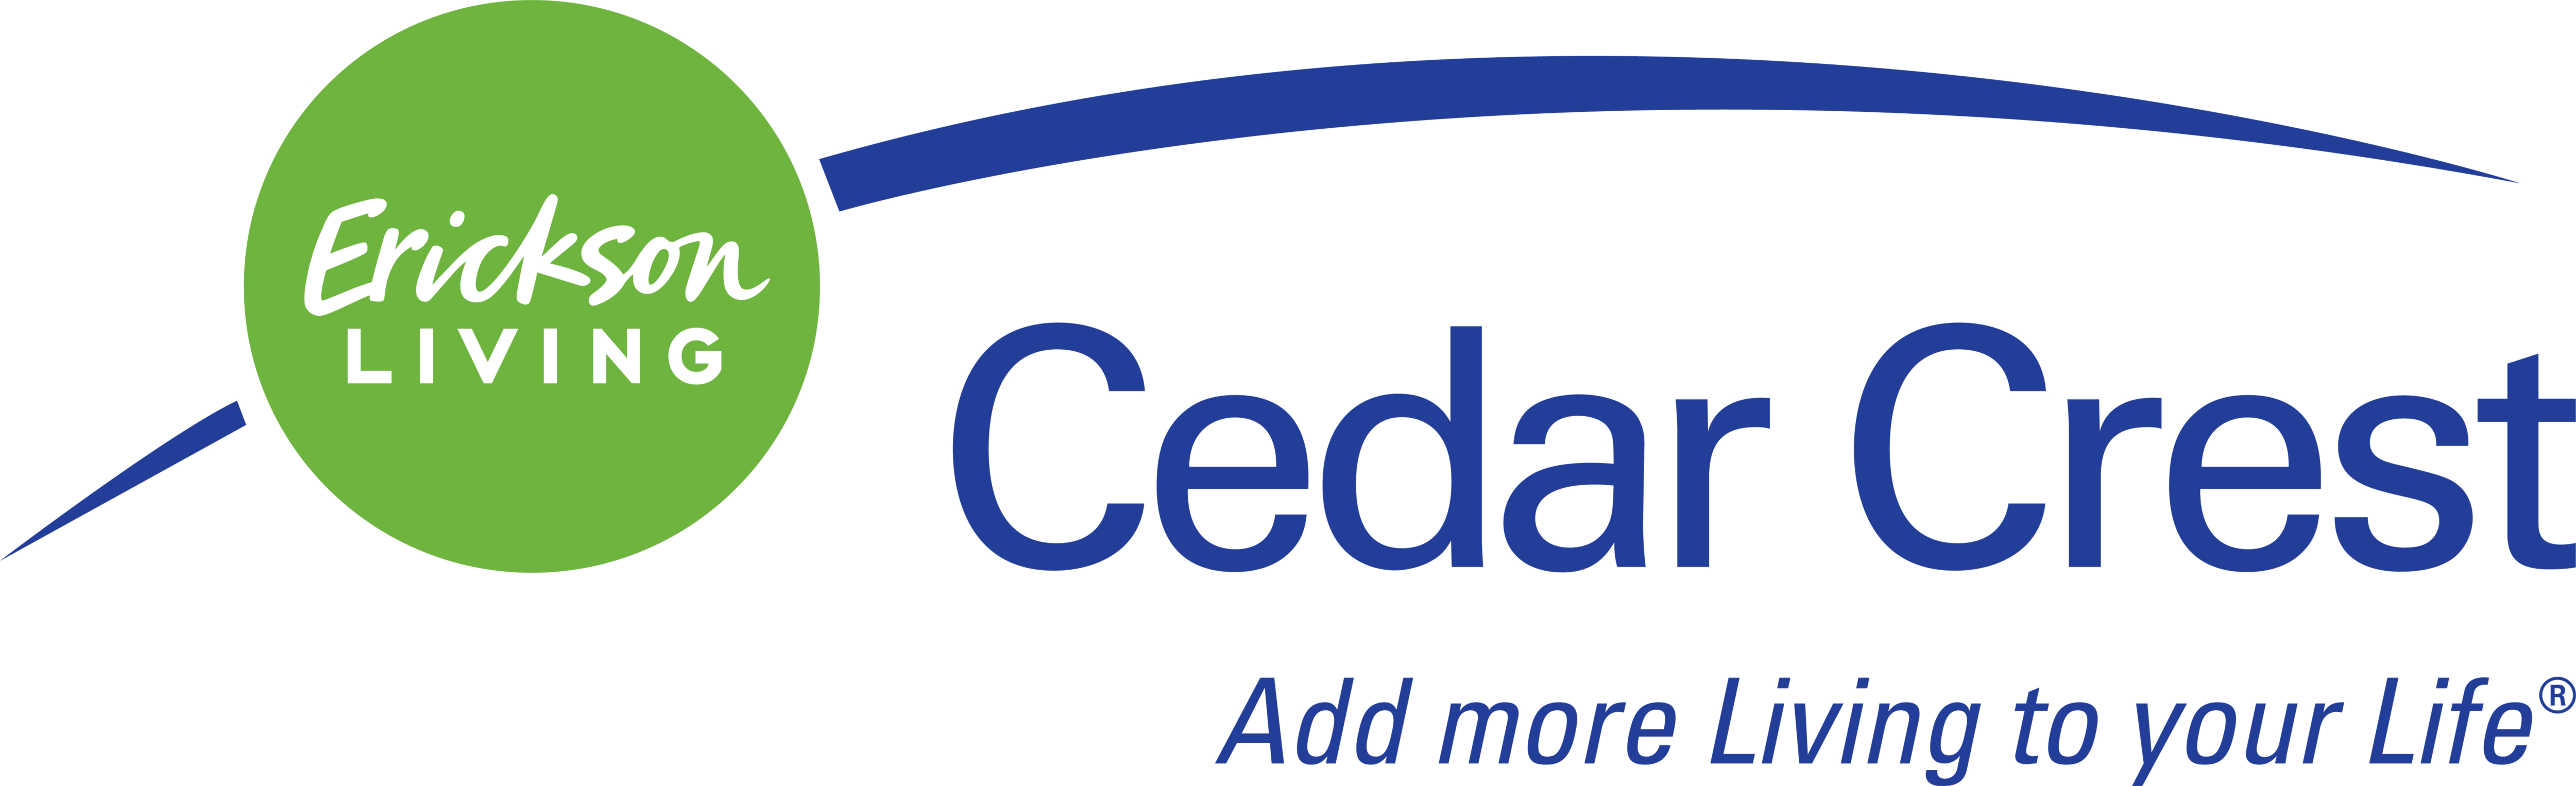 Cedar Crest Village - Erickson Living logo